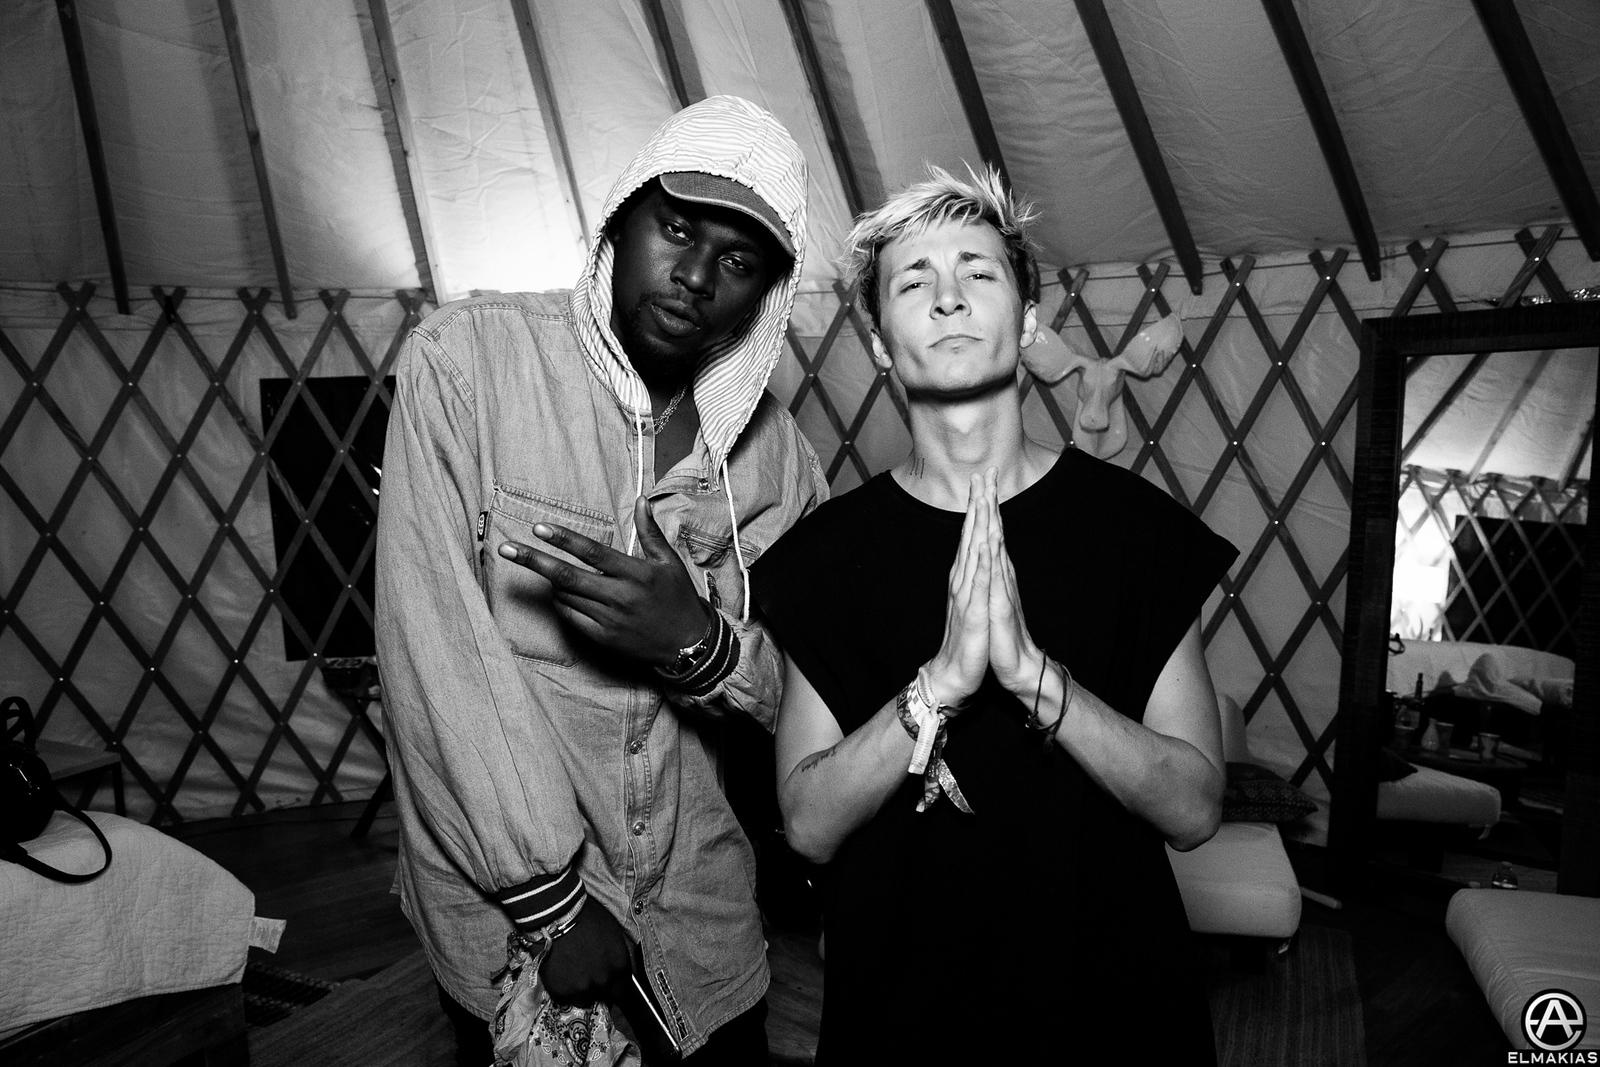 Theophilus London and Roy English at Coachella by Adam Elmakias